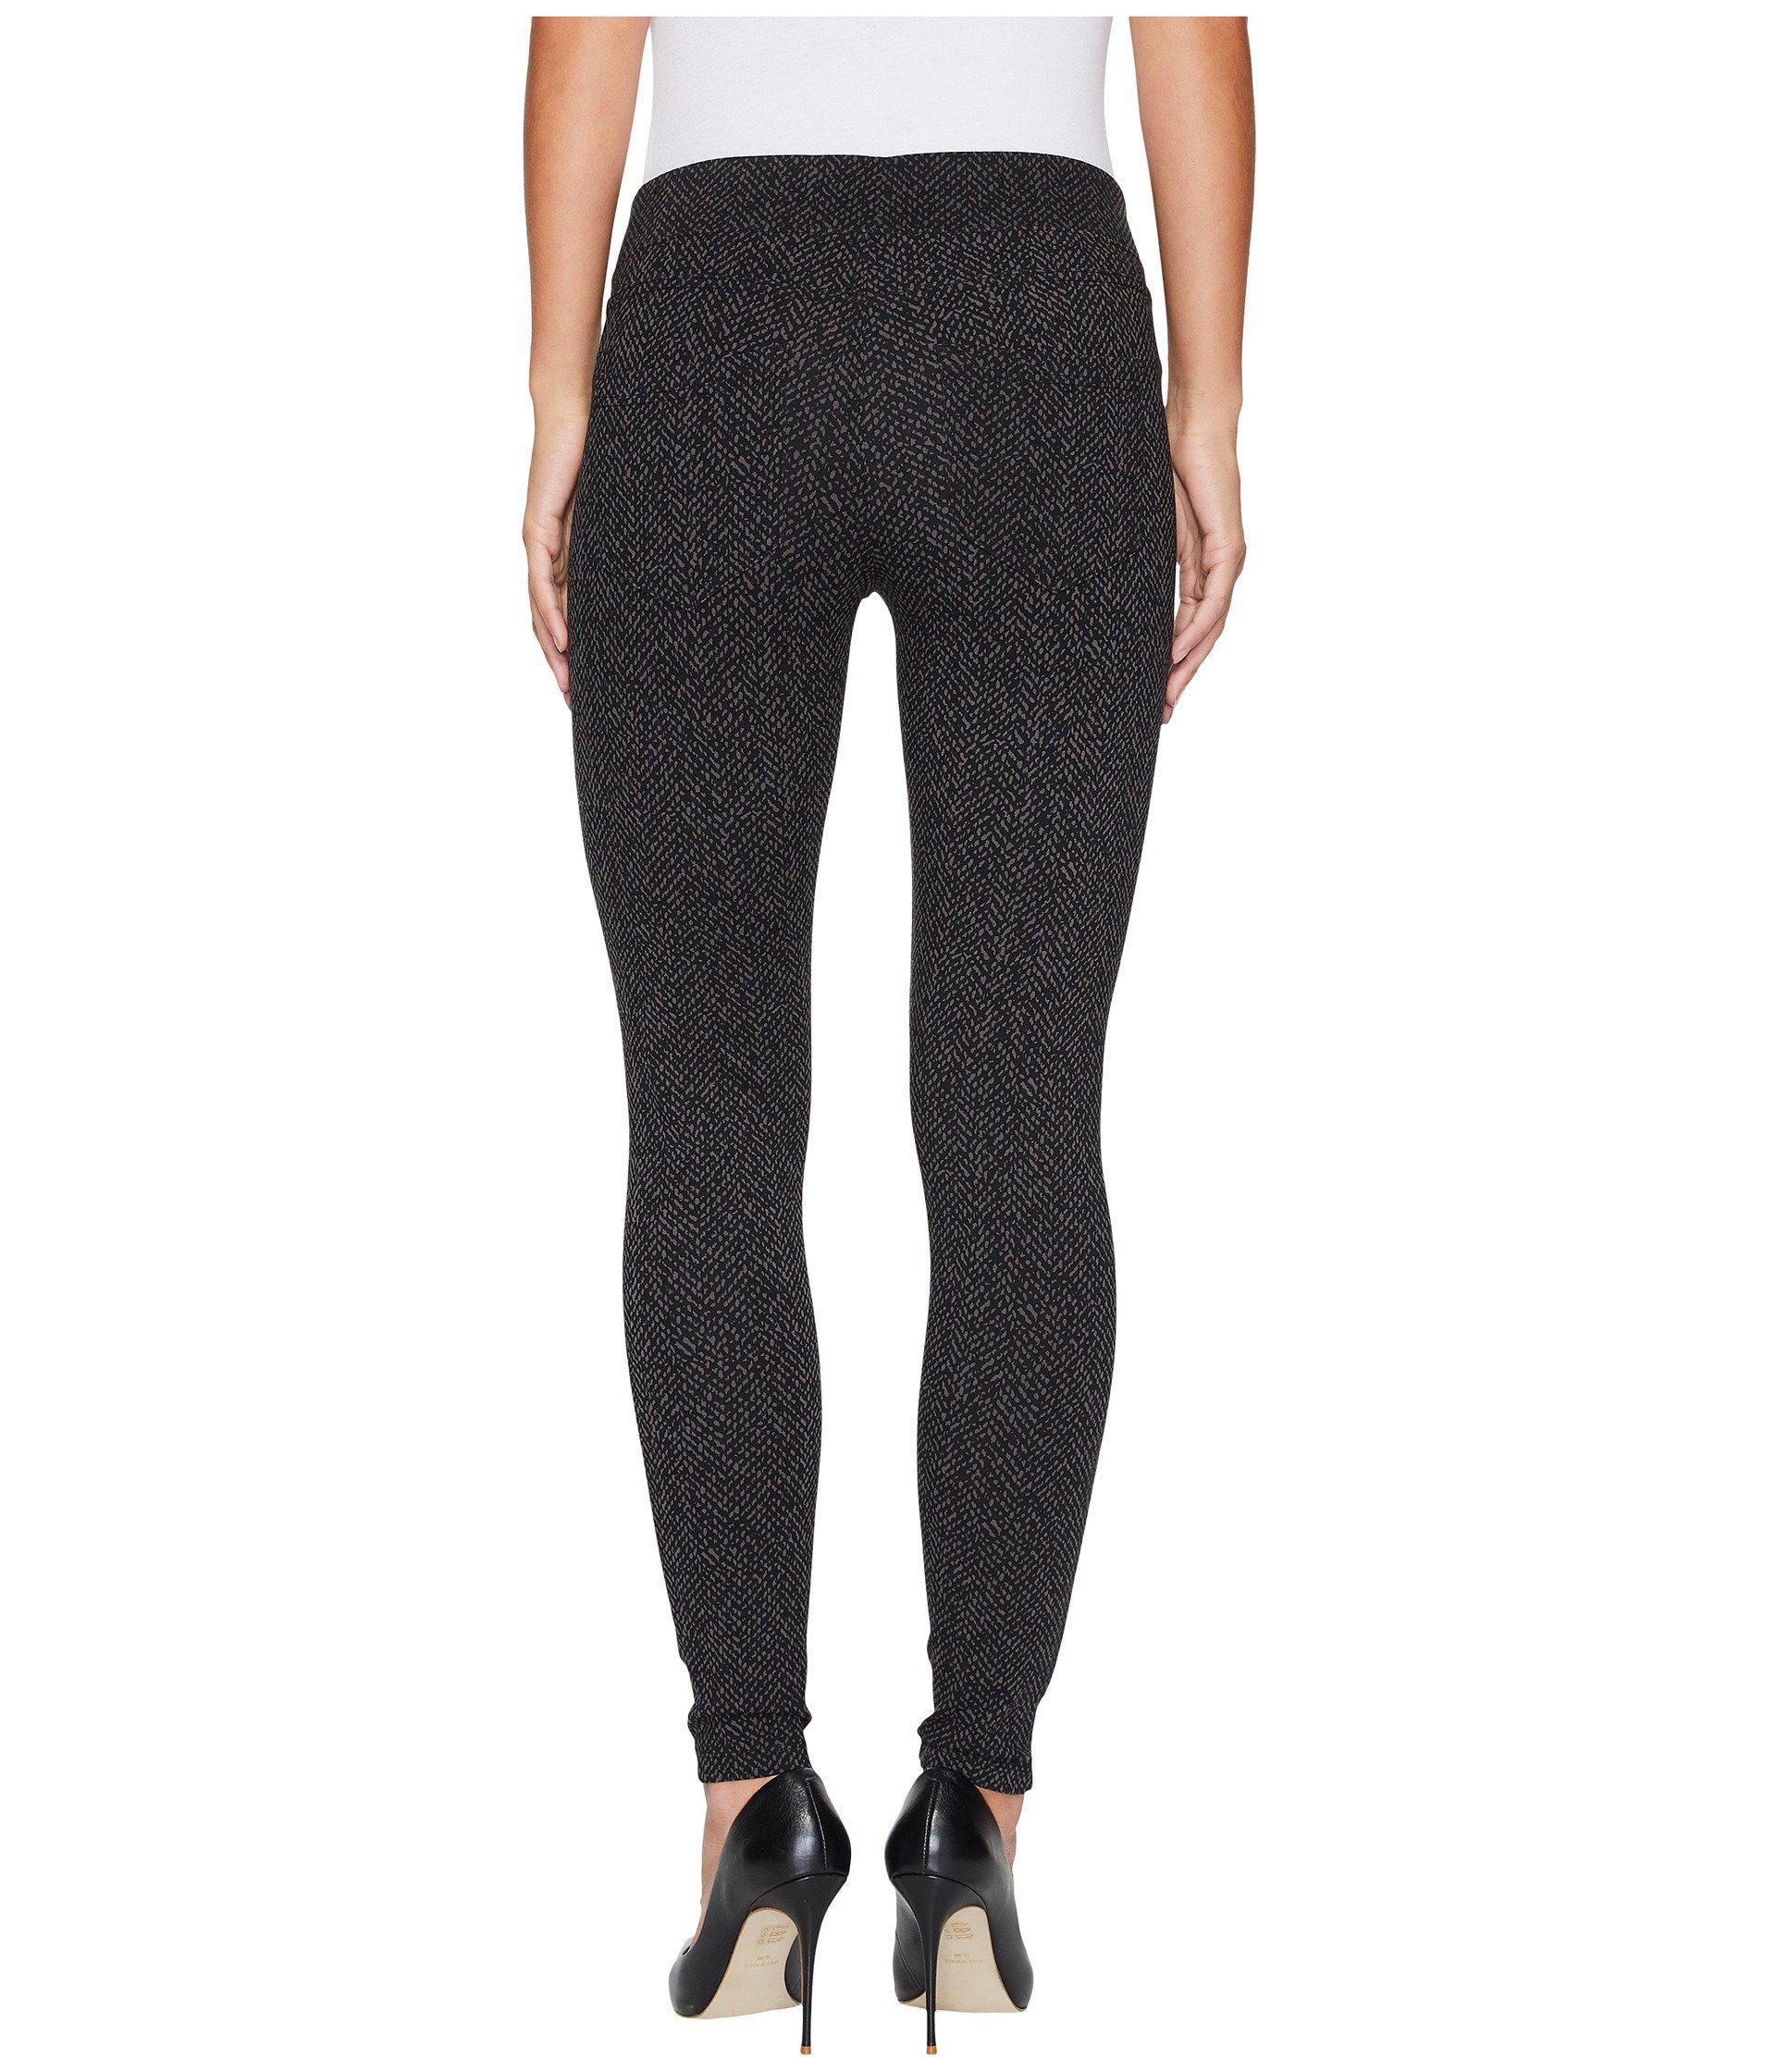 Liverpool Jeans Company Womens Sienna Pull On Legging in Glenn Windowpane Soft Ponte Knit